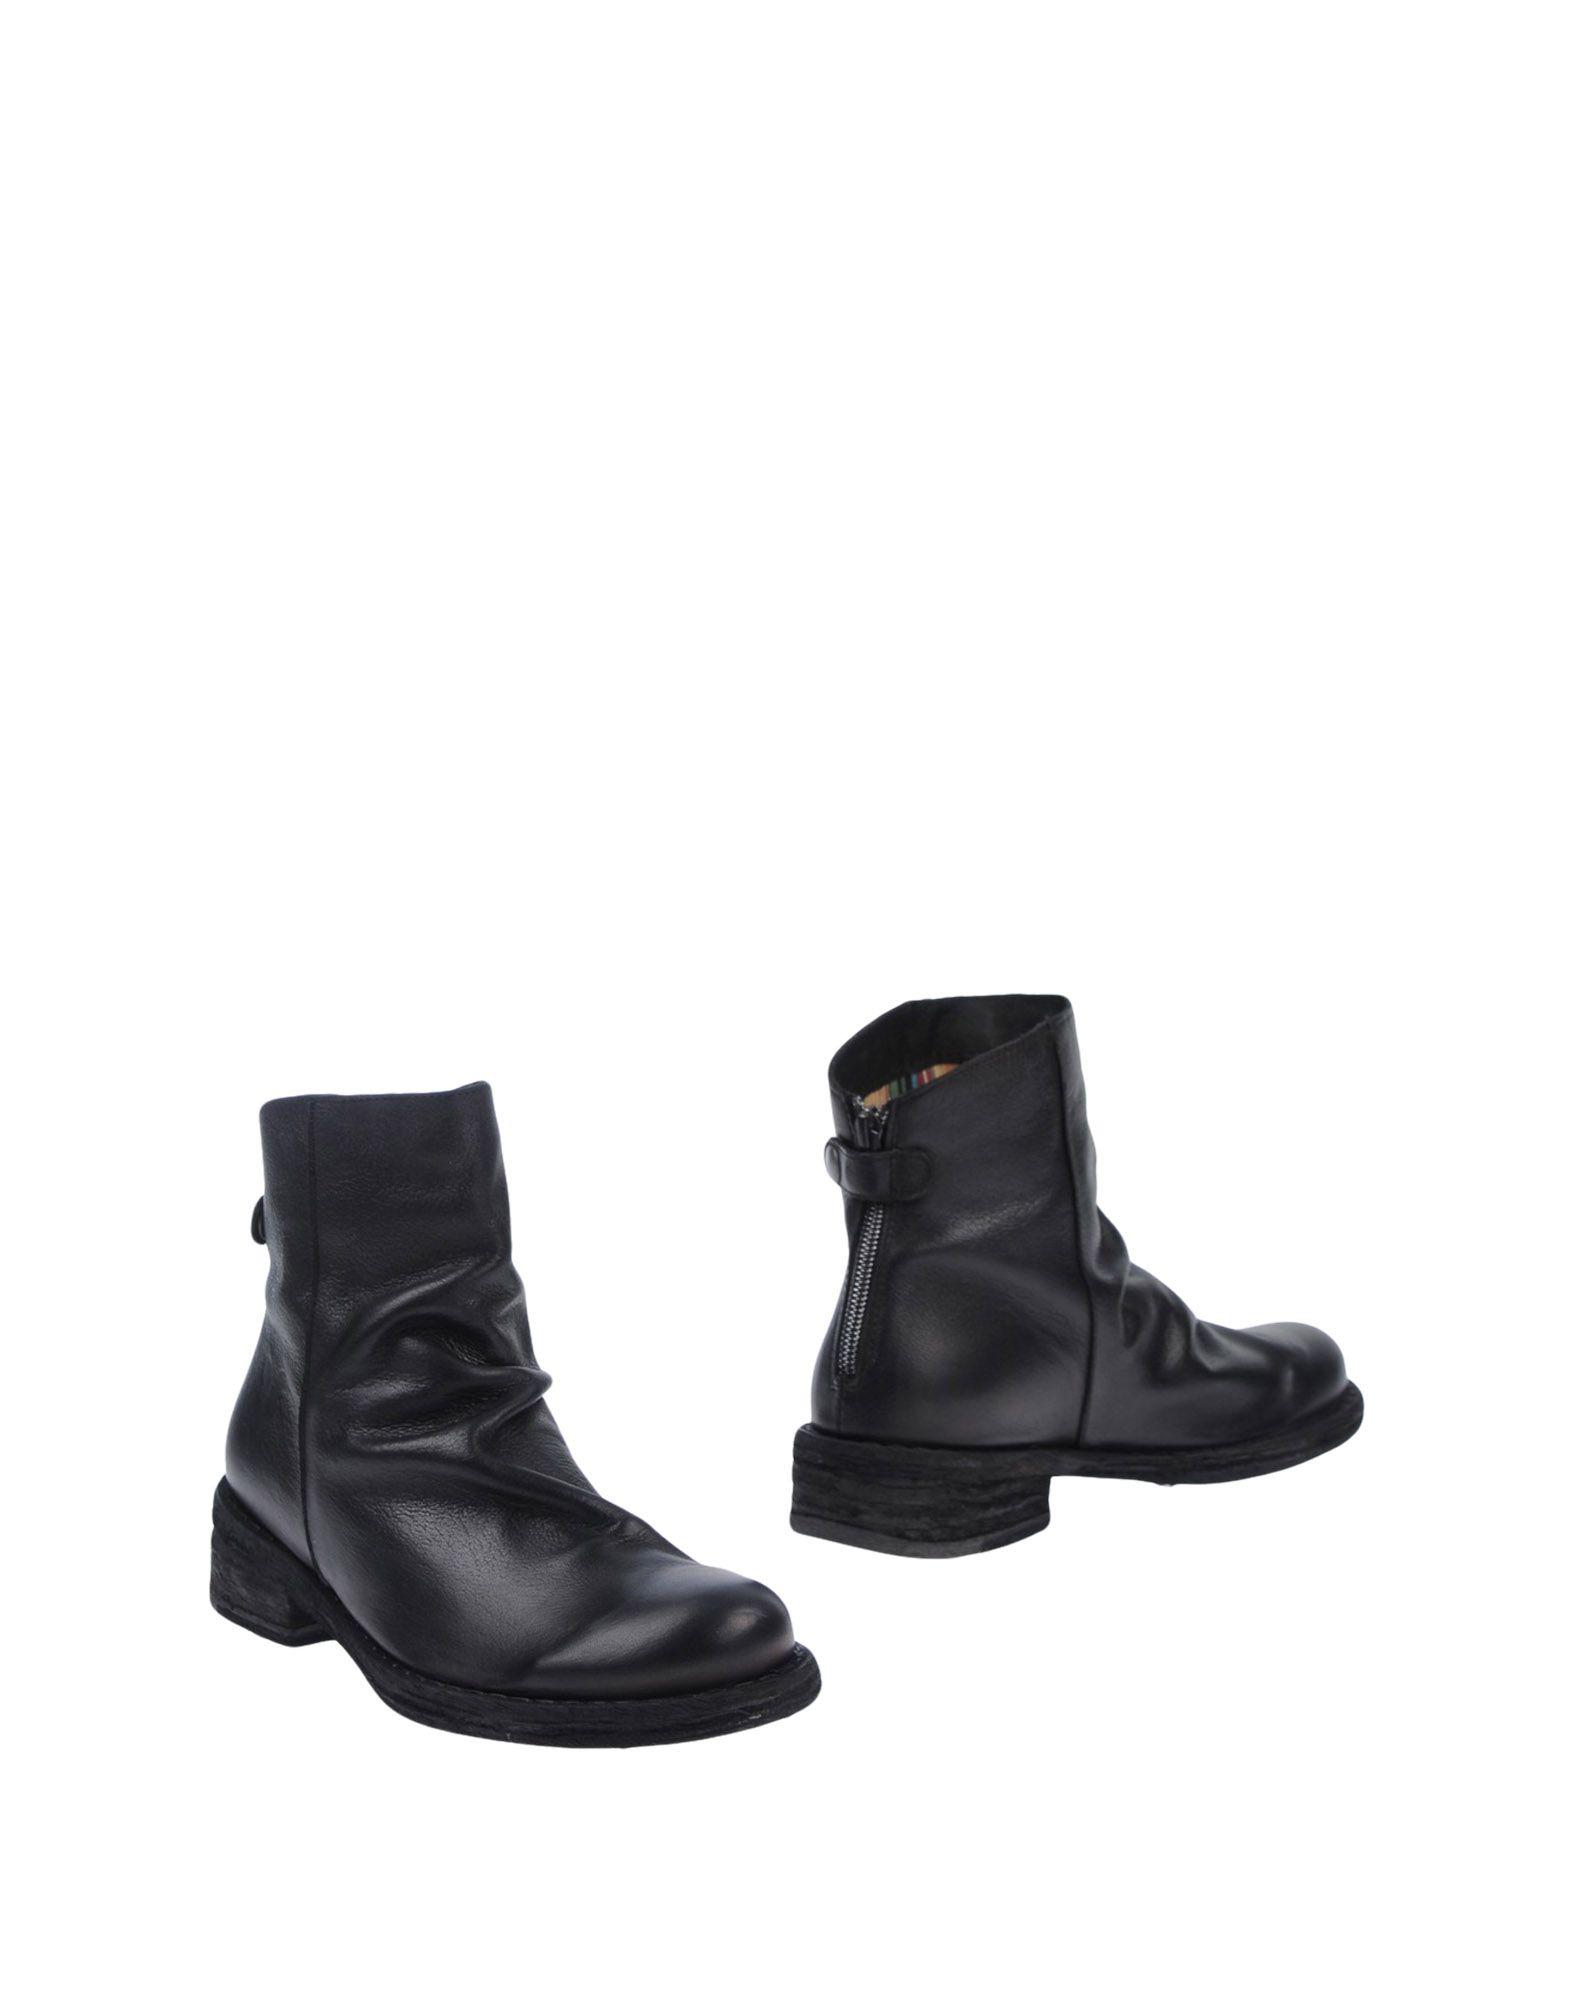 Felmini Stiefelette Schuhe Damen  11509016FL Heiße Schuhe Stiefelette 50cd0d